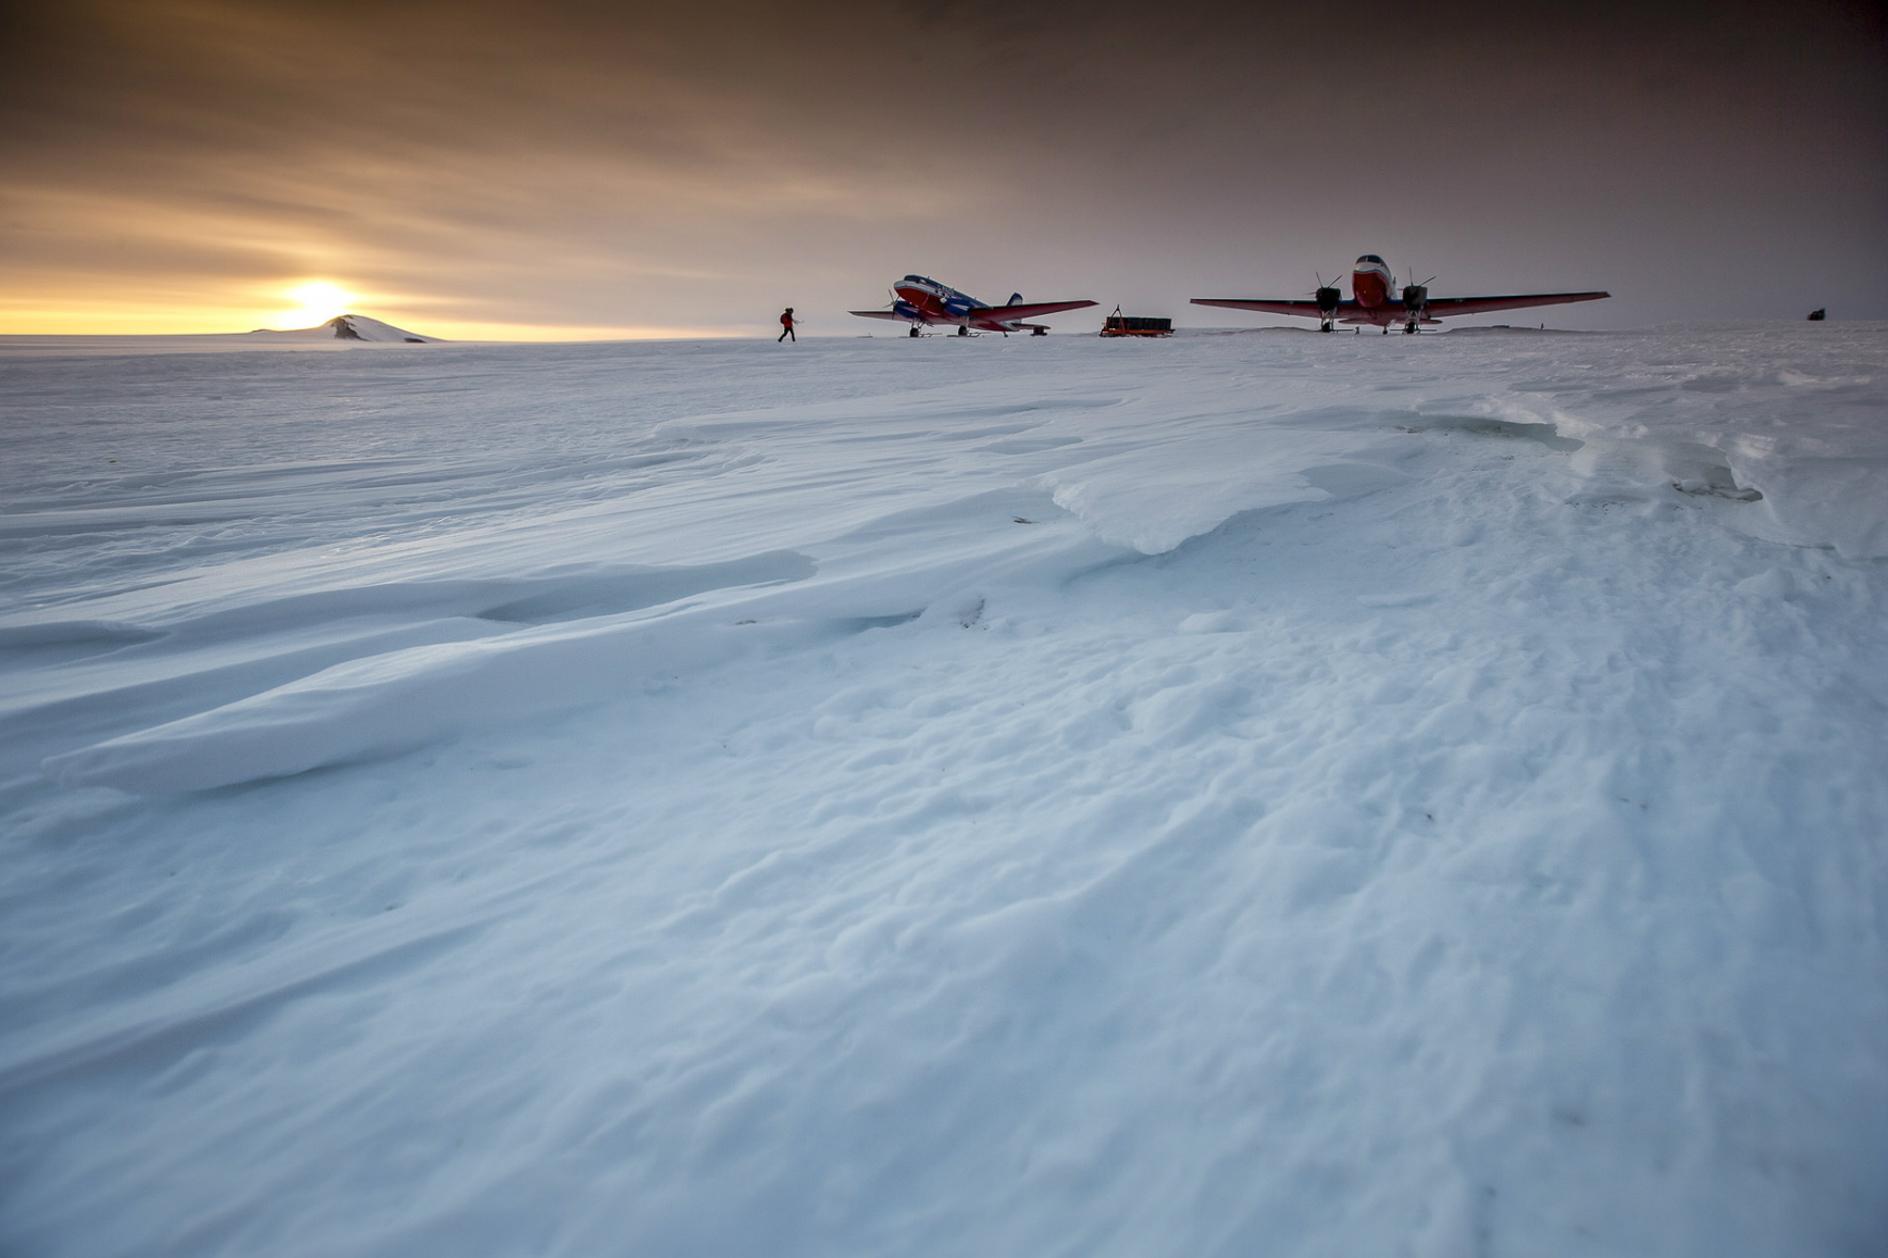 Cory-Richards-Photographer-Antarctica-18.jpg